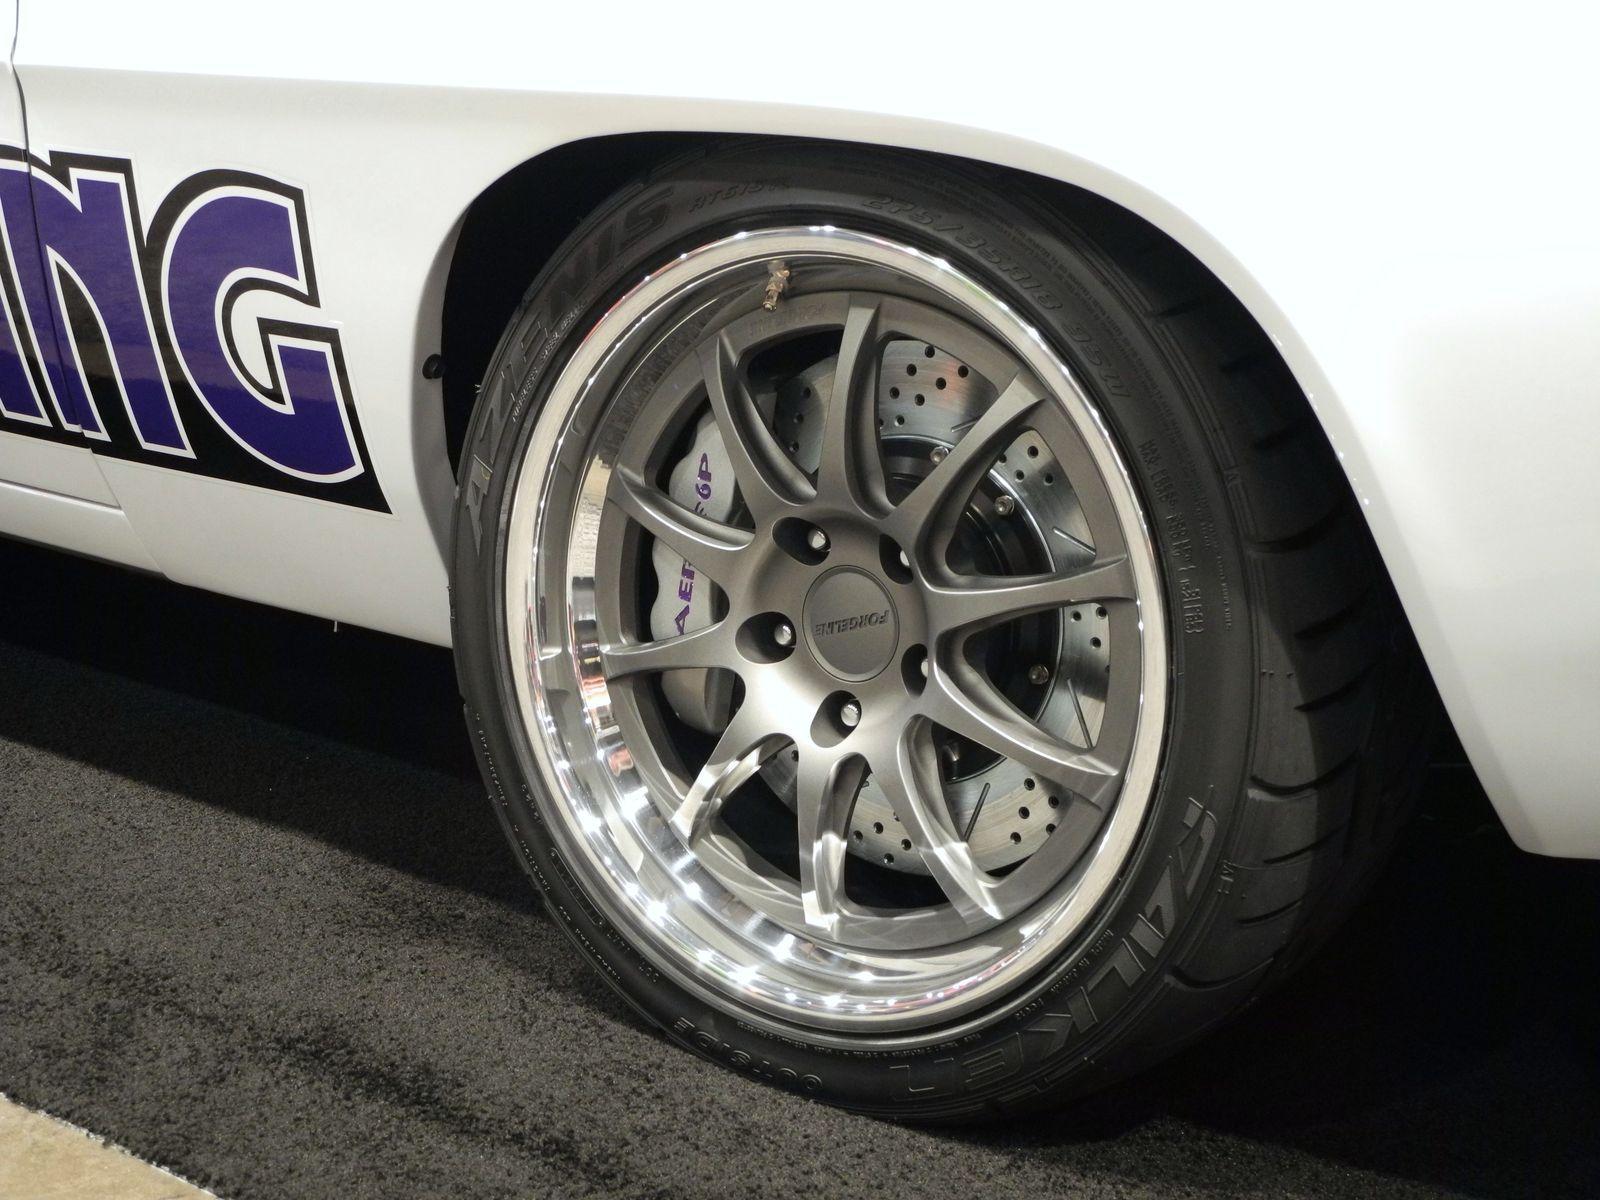 1969 Chevrolet Camaro | The Viking Performance Berserker Camaro on Forgeline GZ3 Wheels